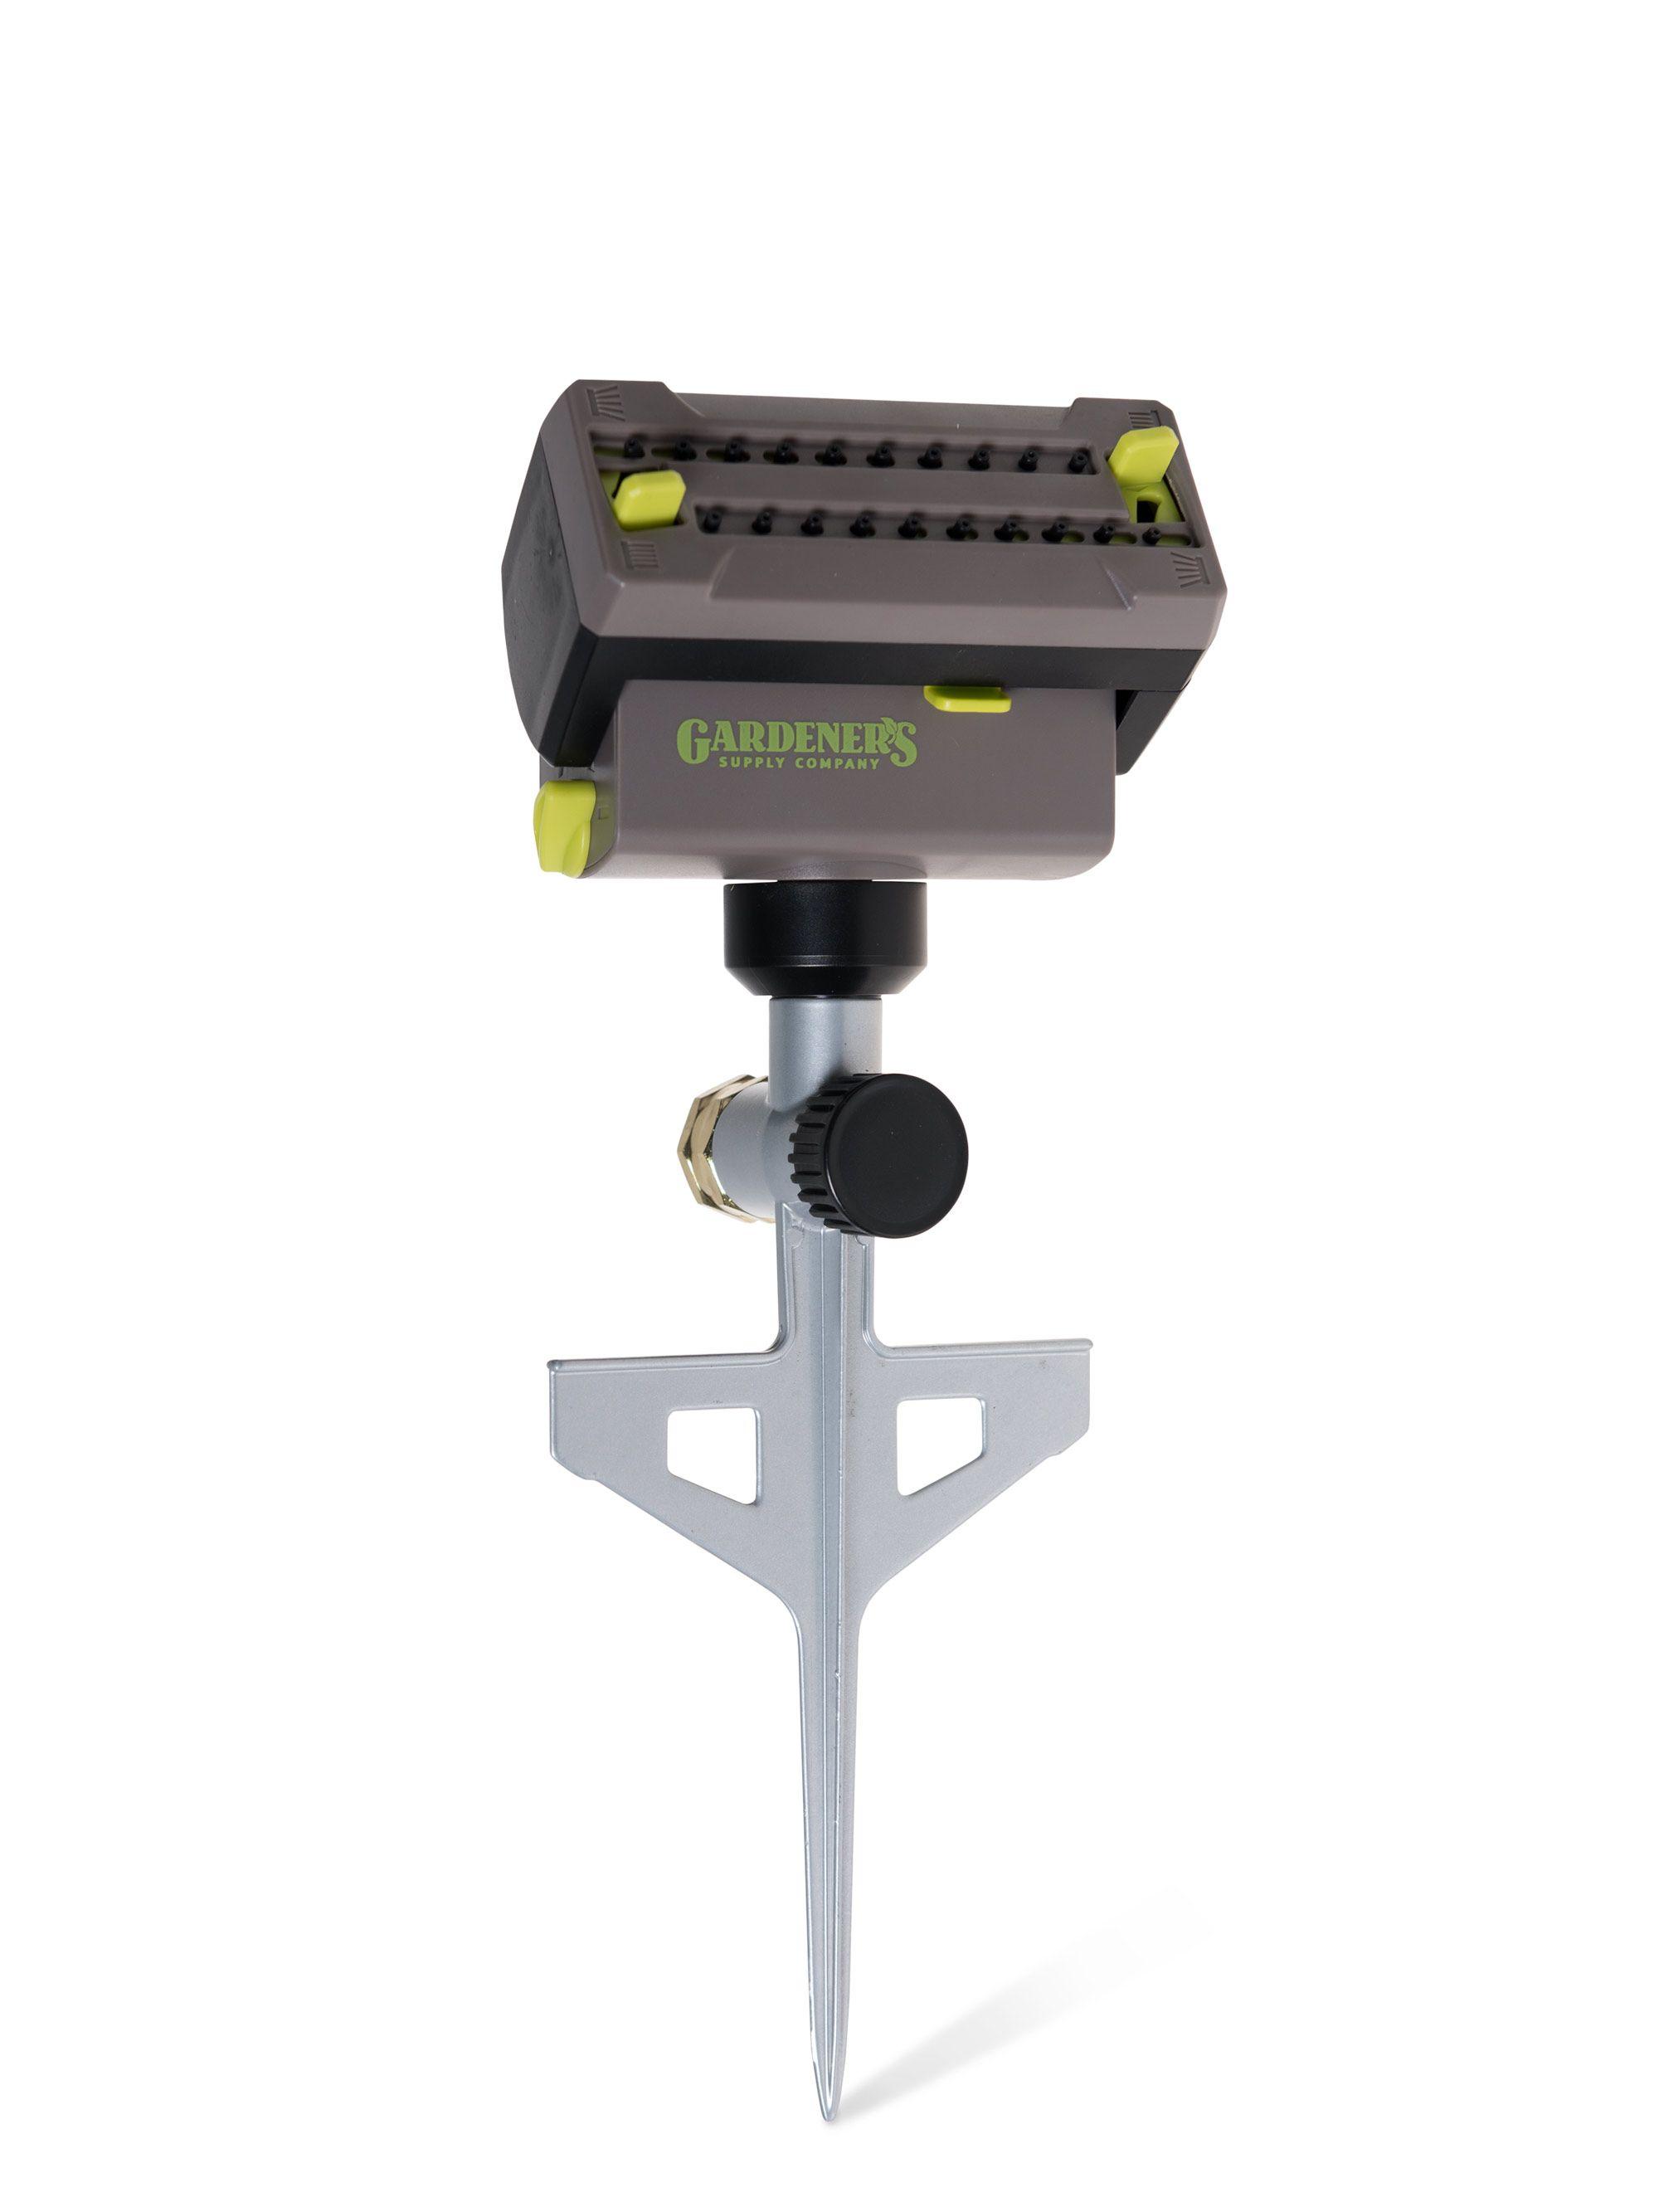 Precision Oscillating Sprinkler With Spike Gardener S Supply In 2020 Oscillating Sprinkler Sprinkler System Diy Garden Supplies